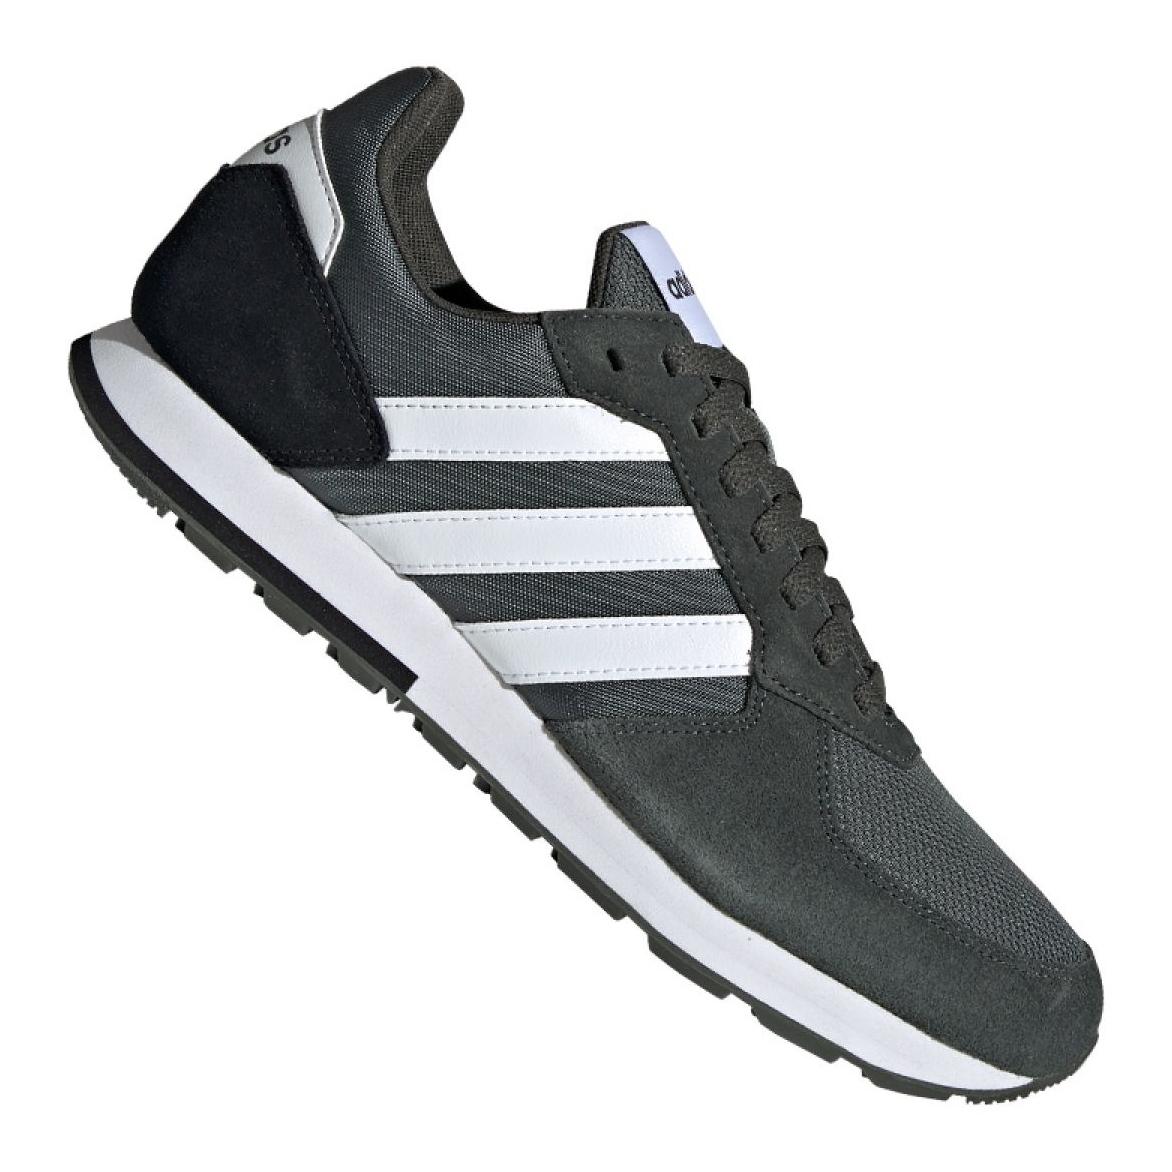 8k M Ee8173 Schoenen Adidas 8k M Adidas eEH2IDYW9